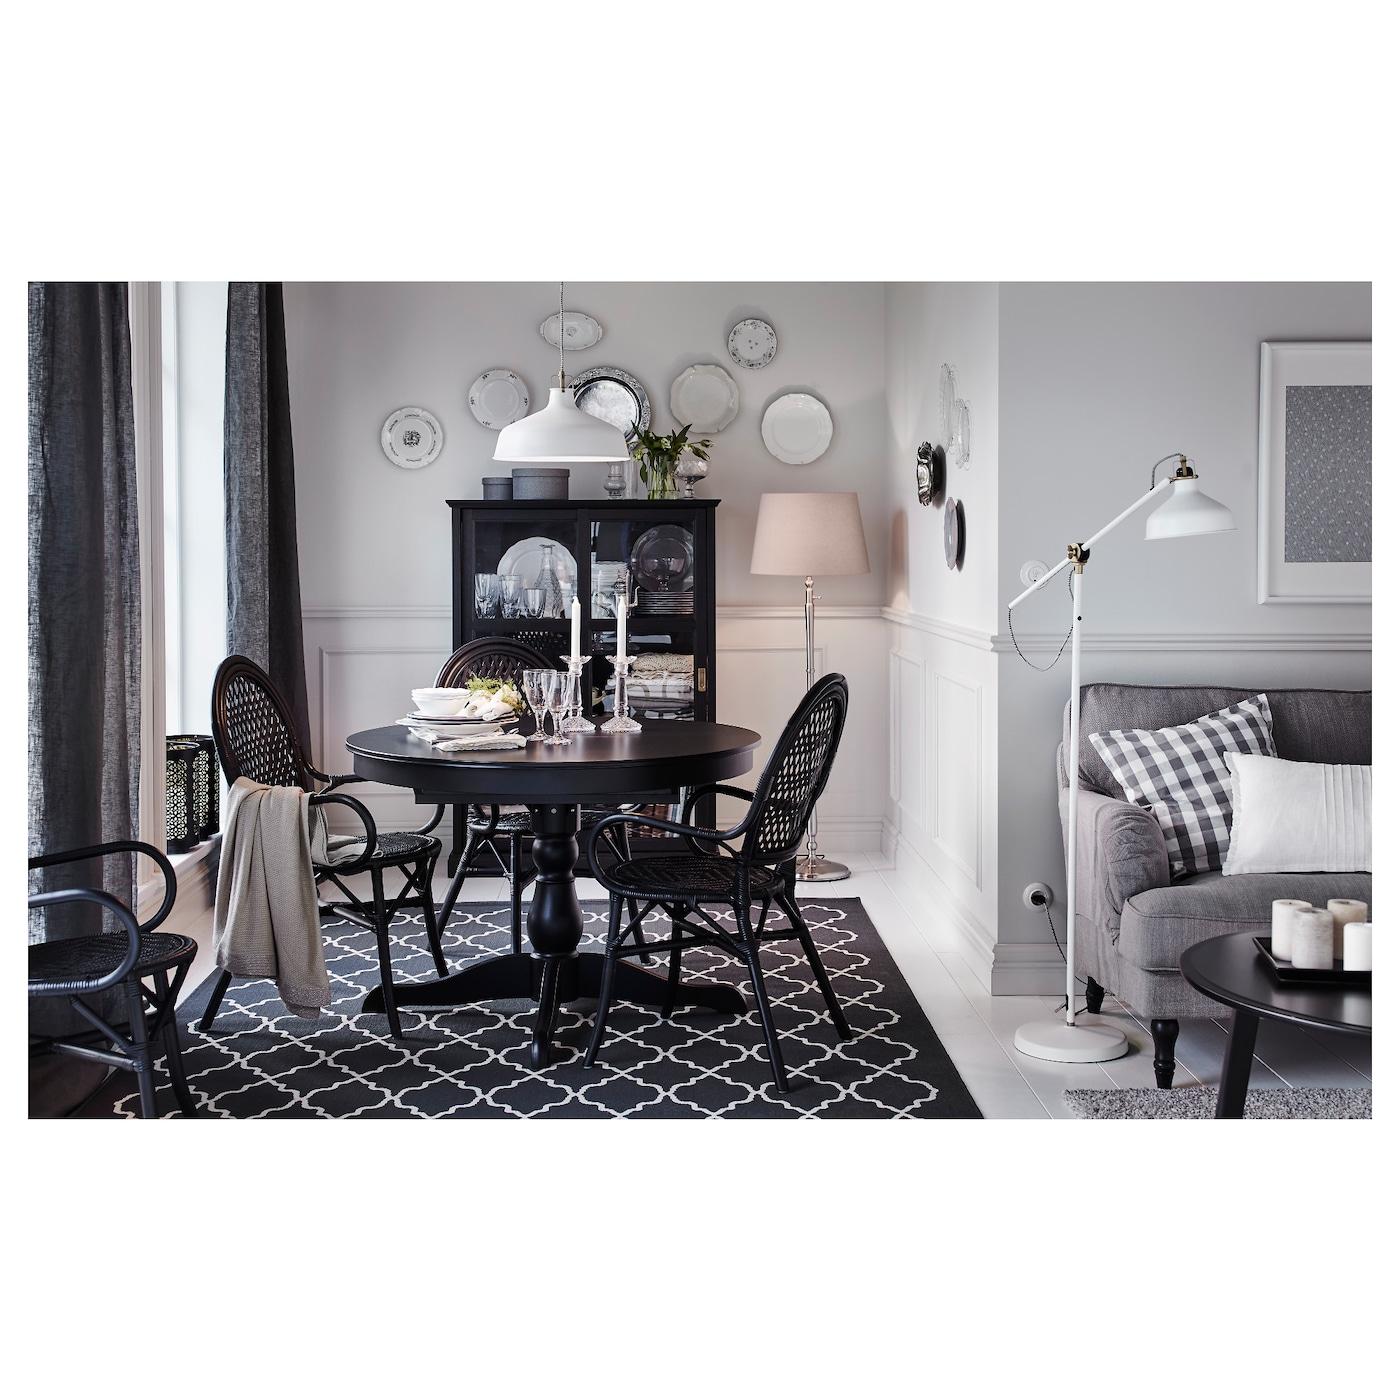 Hovslund alfombra pelo corto gris oscuro 160 x 230 cm ikea - Alfombra gris ikea ...